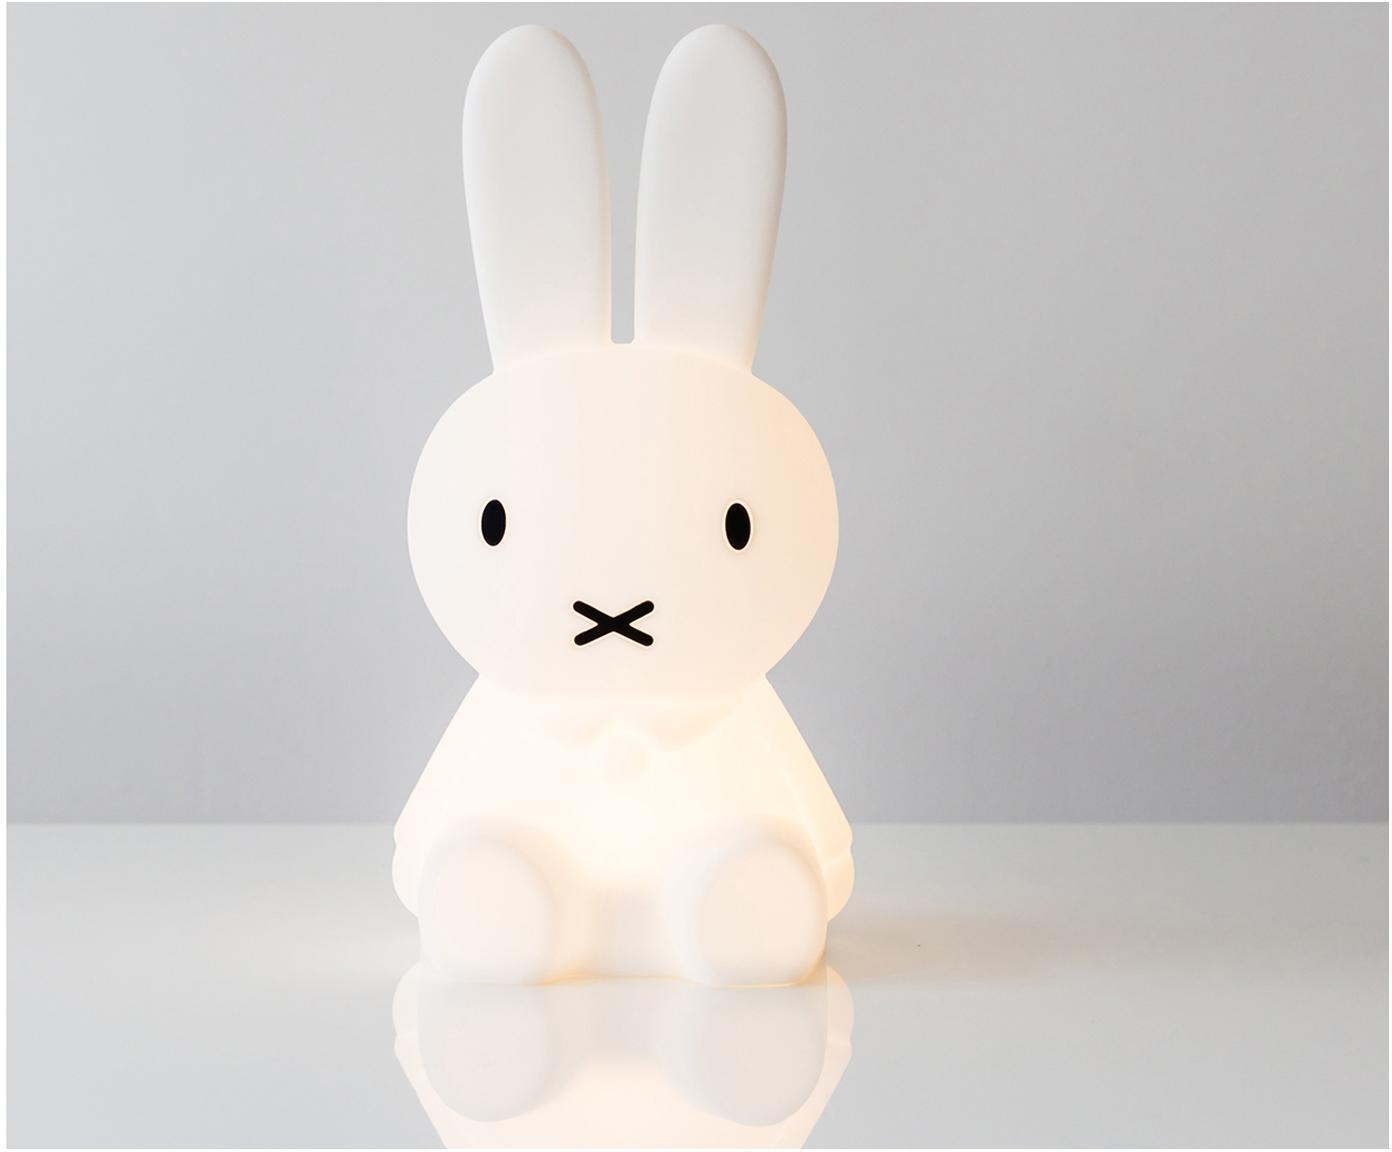 LED tafellamp Nijntje First Light, Siliconen, vrij van BPA, Wit, 15 x 30 cm